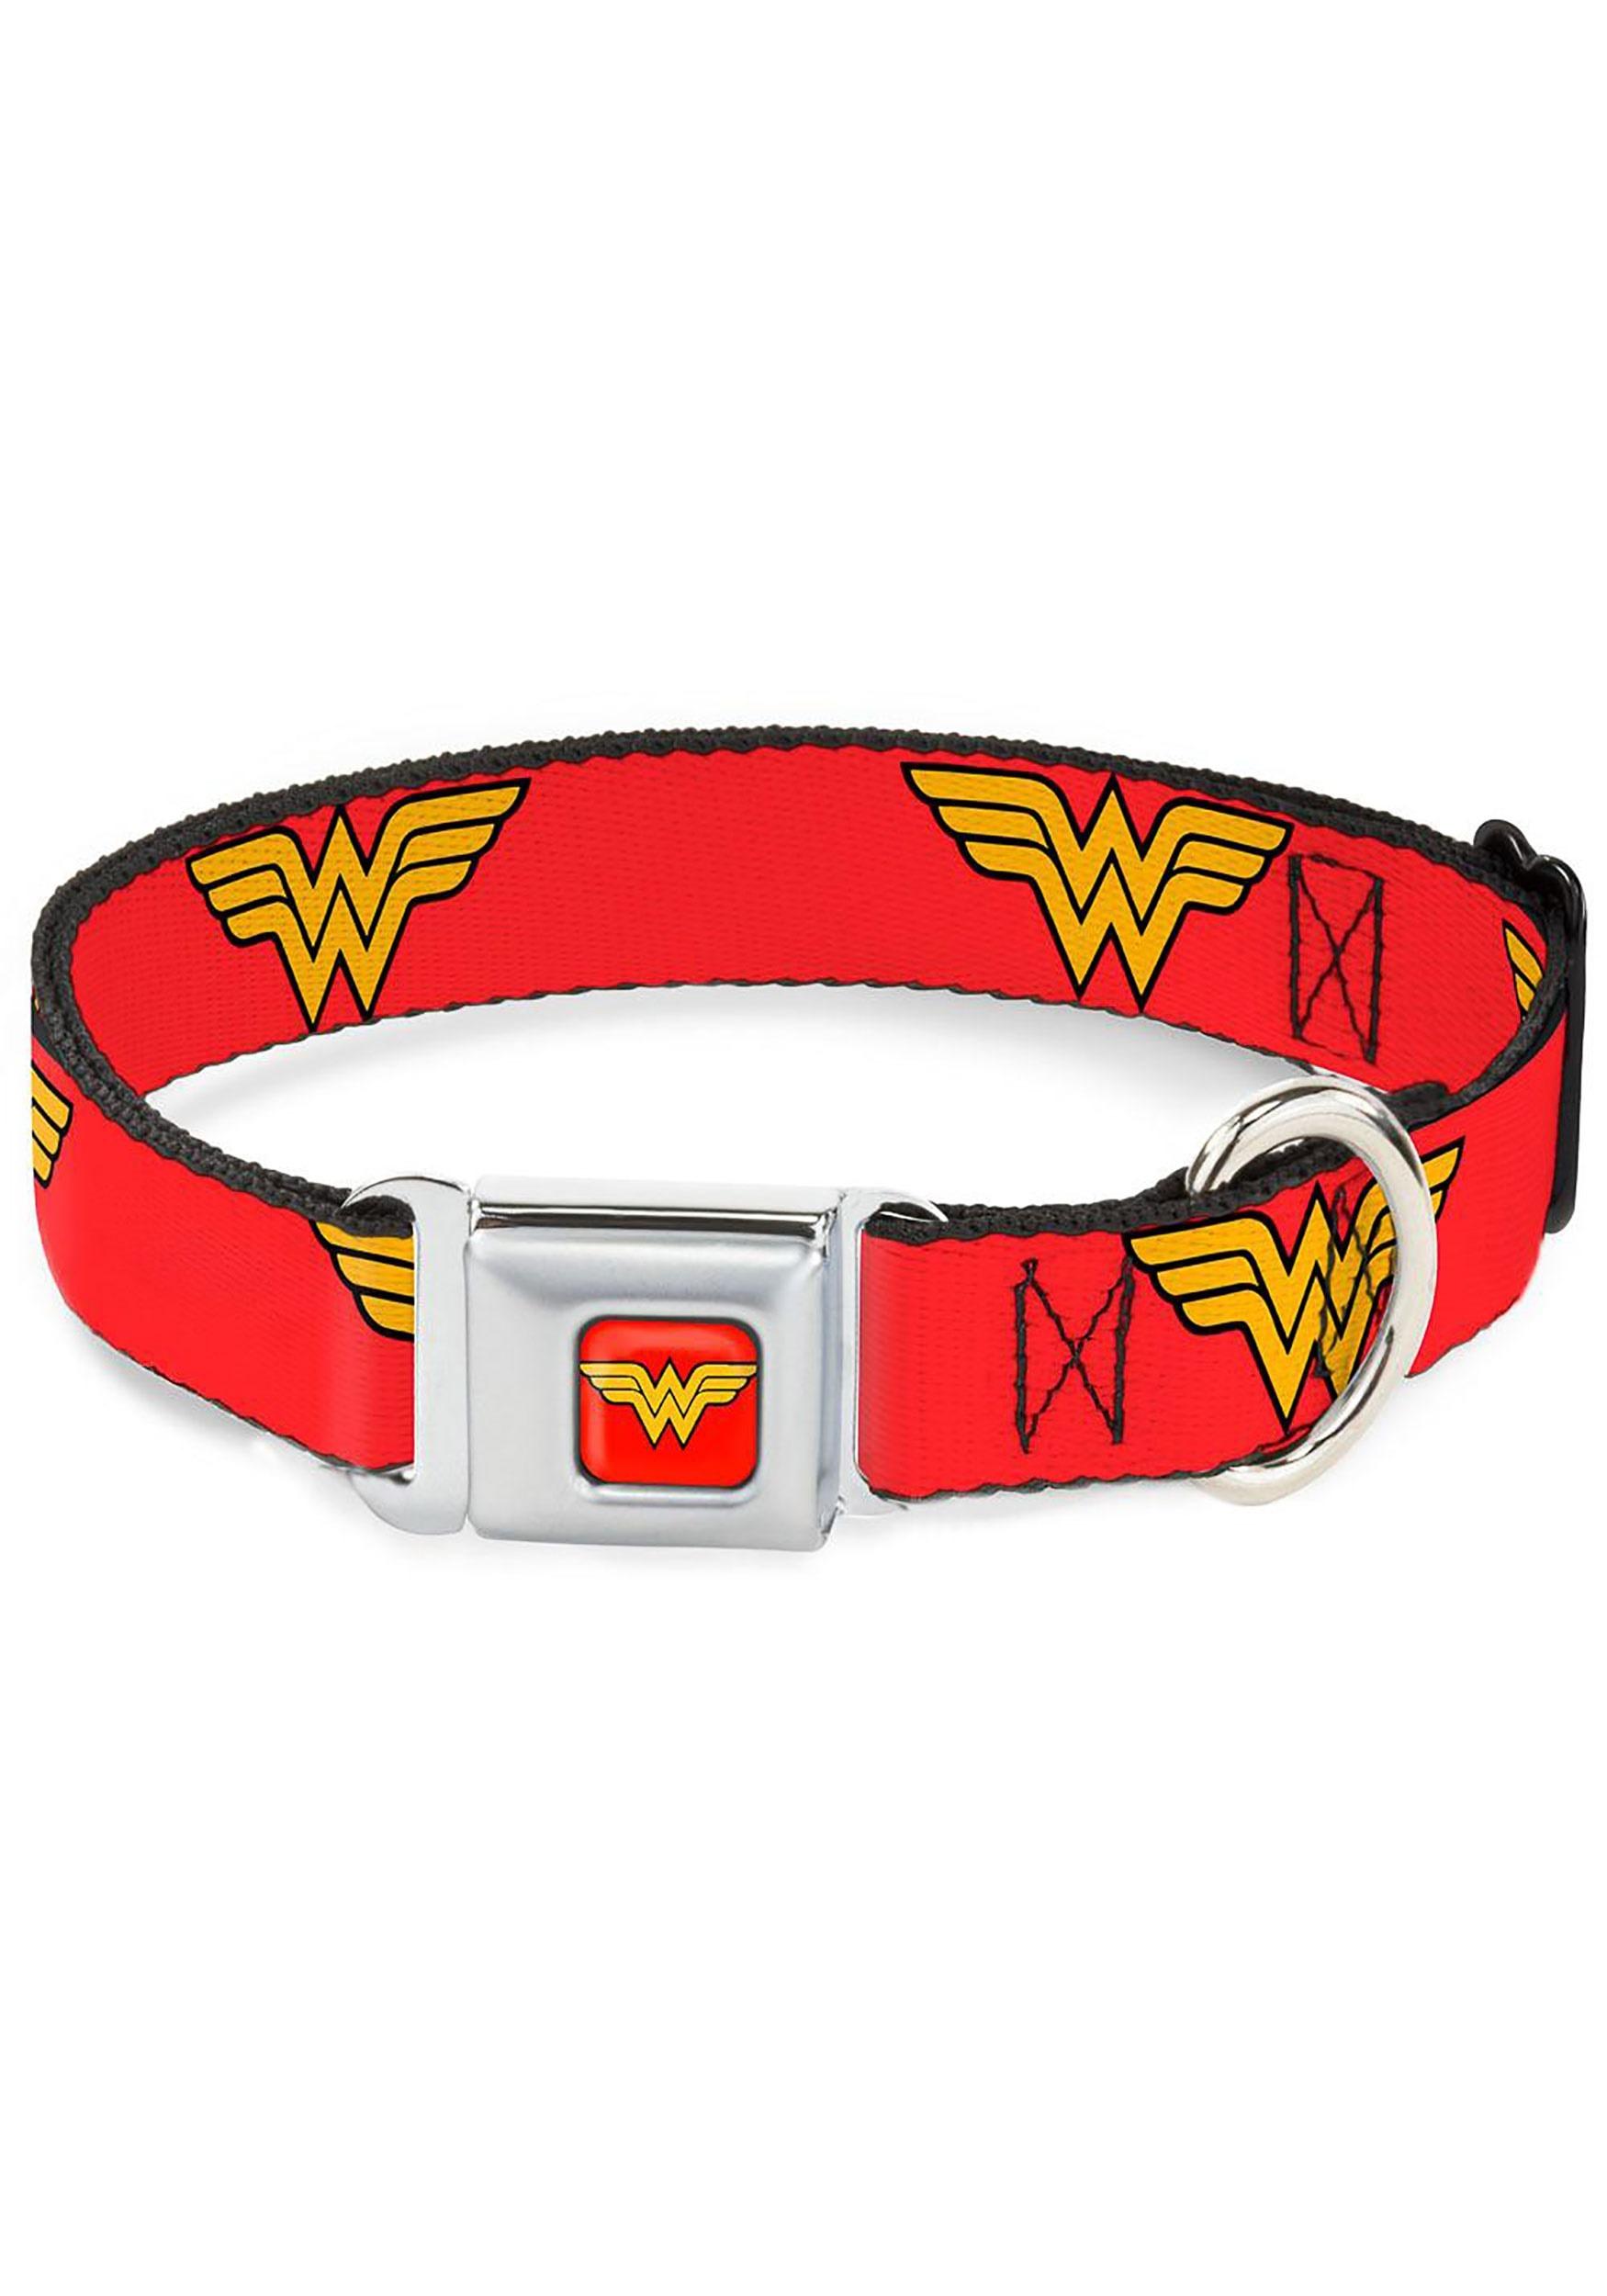 Wonder_Woman_Logo_Red_Seatbelt_Buckle_Dog_Collar_1_Inch